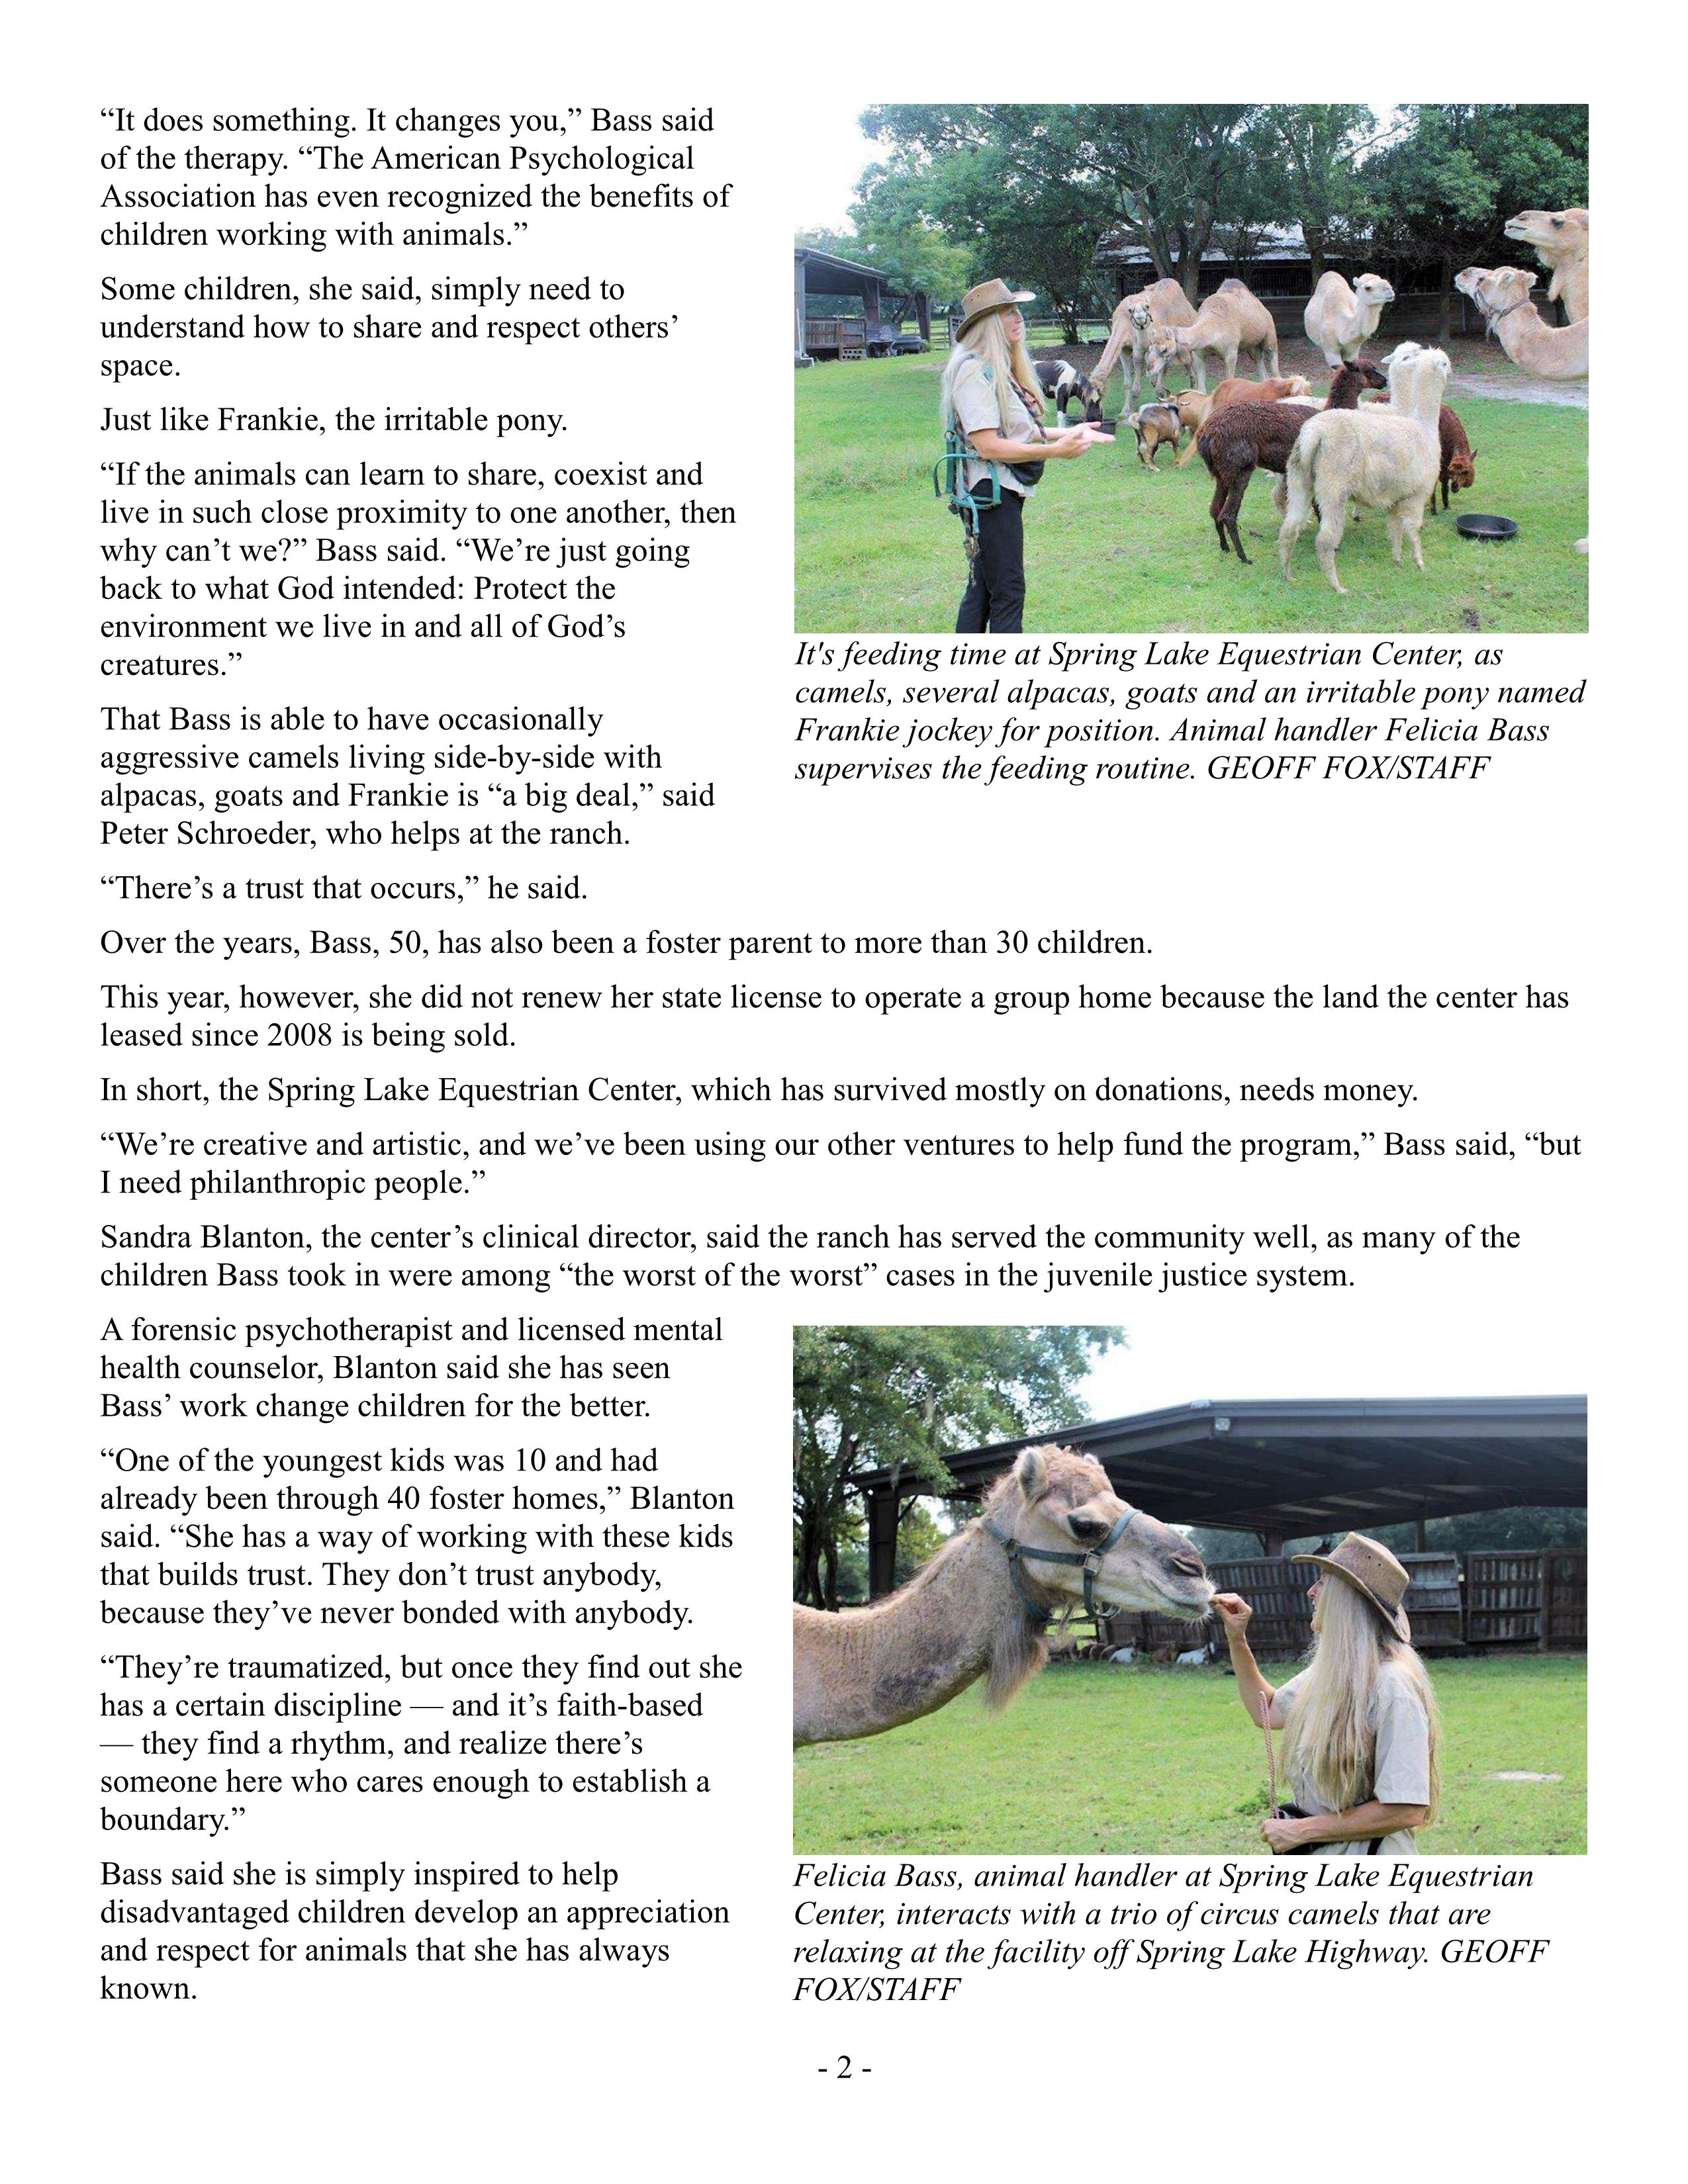 Spring Lake woman rescues camels, horses, wayward teens 09-04-2014 Pg2